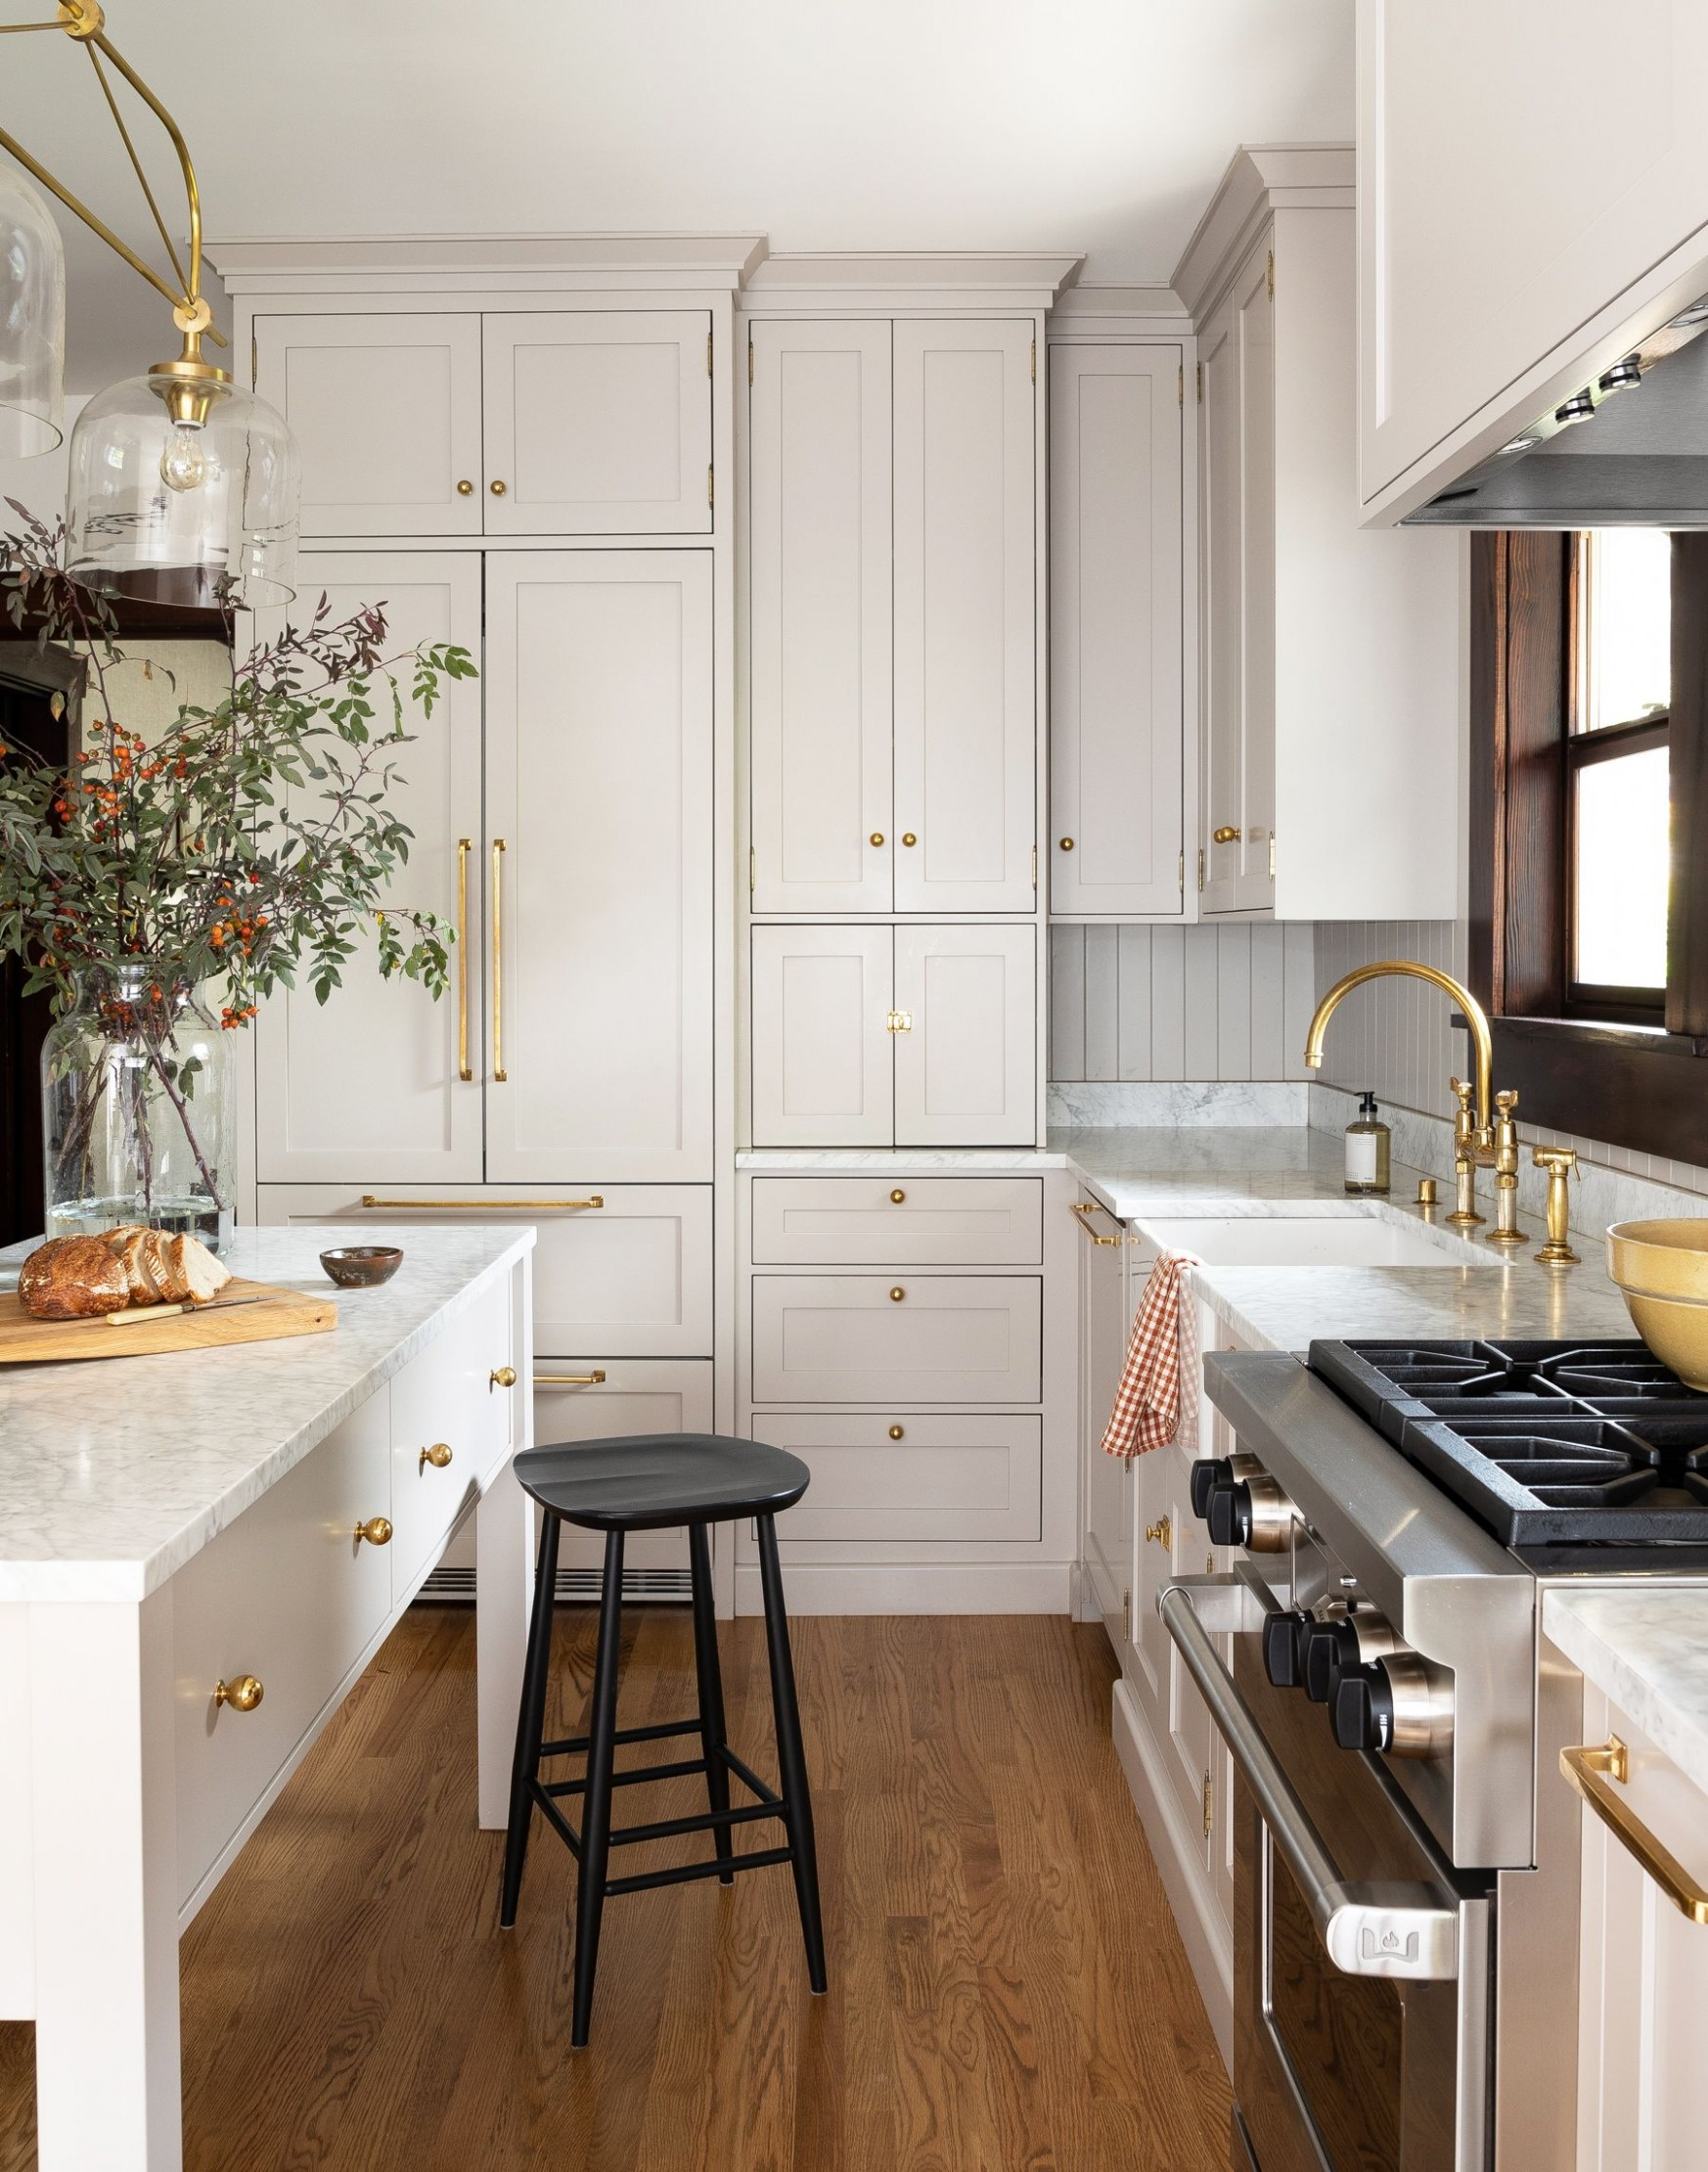 9 Kitchen Cabinet Design Ideas 9 - Unique Kitchen Cabinet Styles - Different Types Of Cabinets In Kitchen